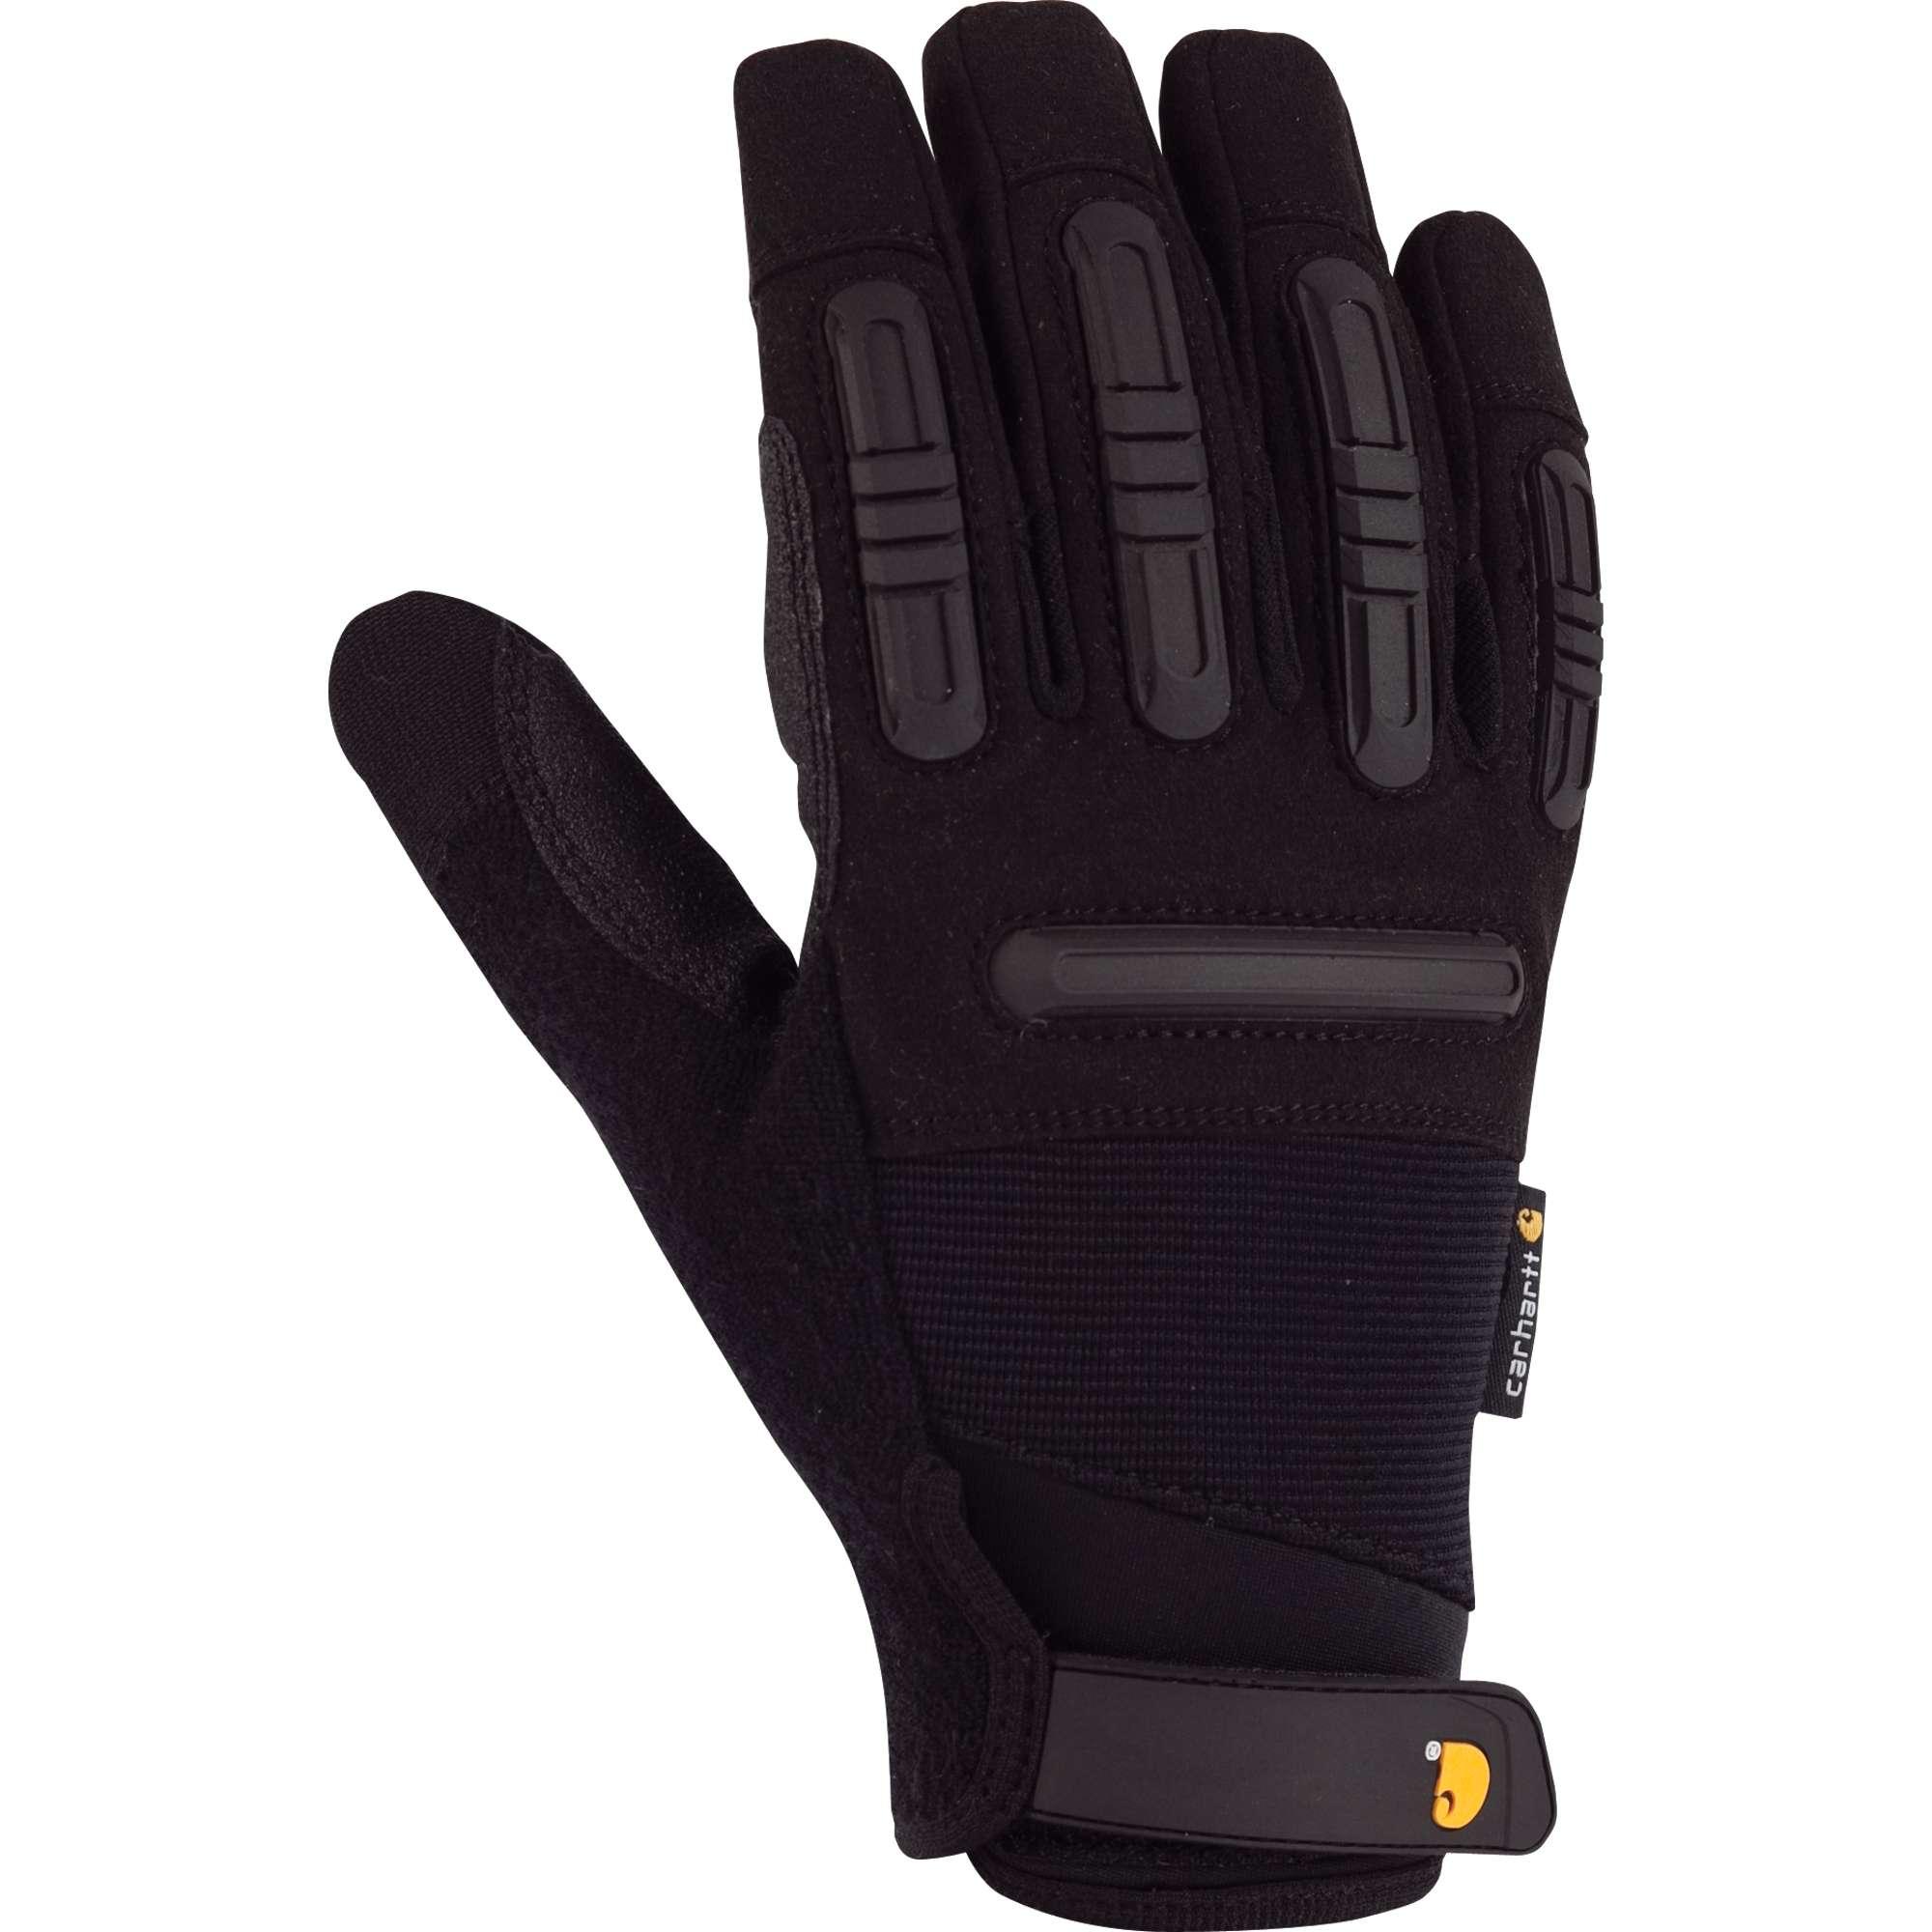 Carhartt Ballistic Glove